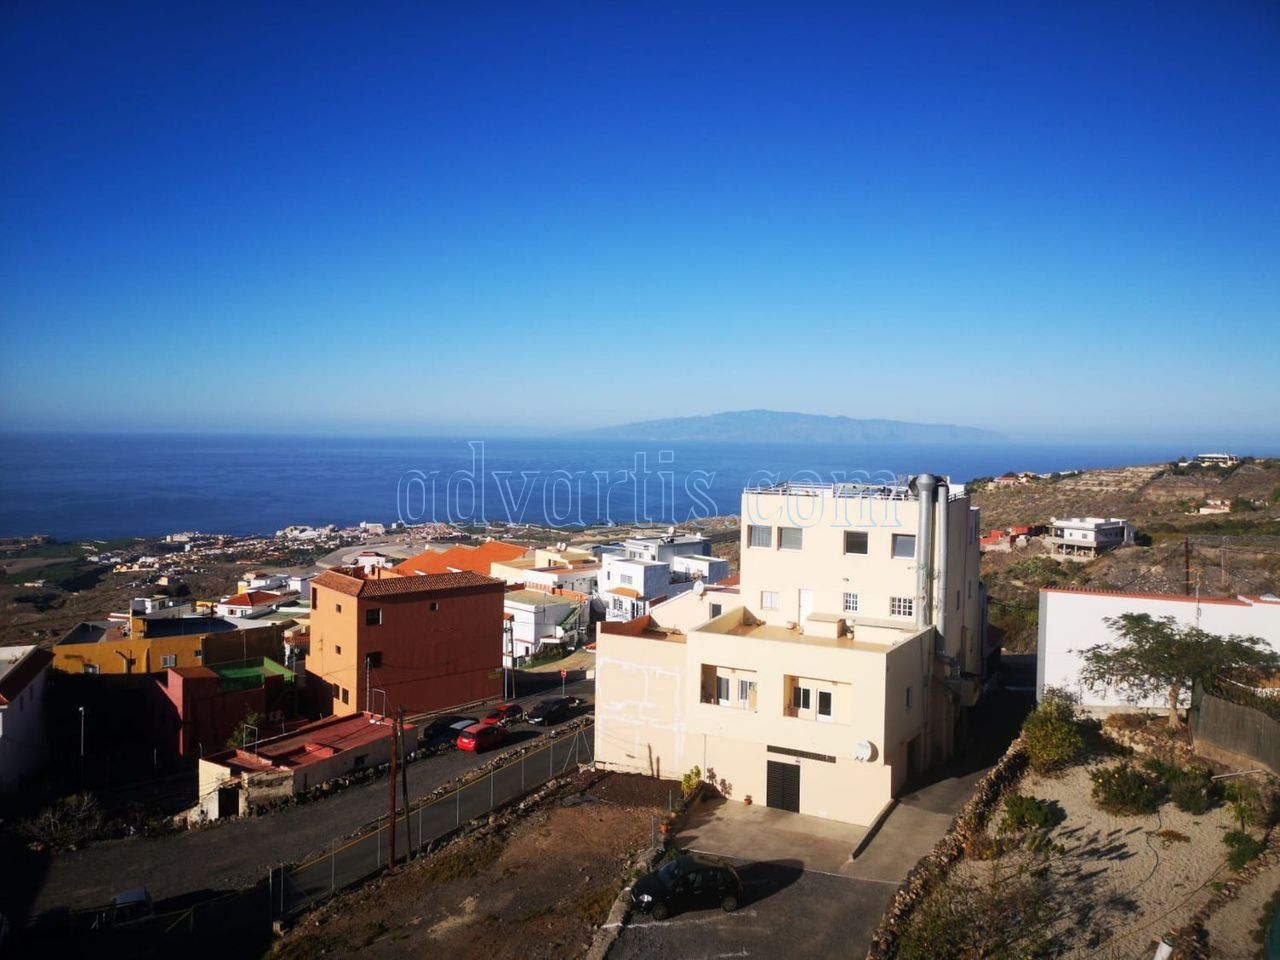 Duplex apartment for sale in Los Menores, Adeje, Tenerife €164.900